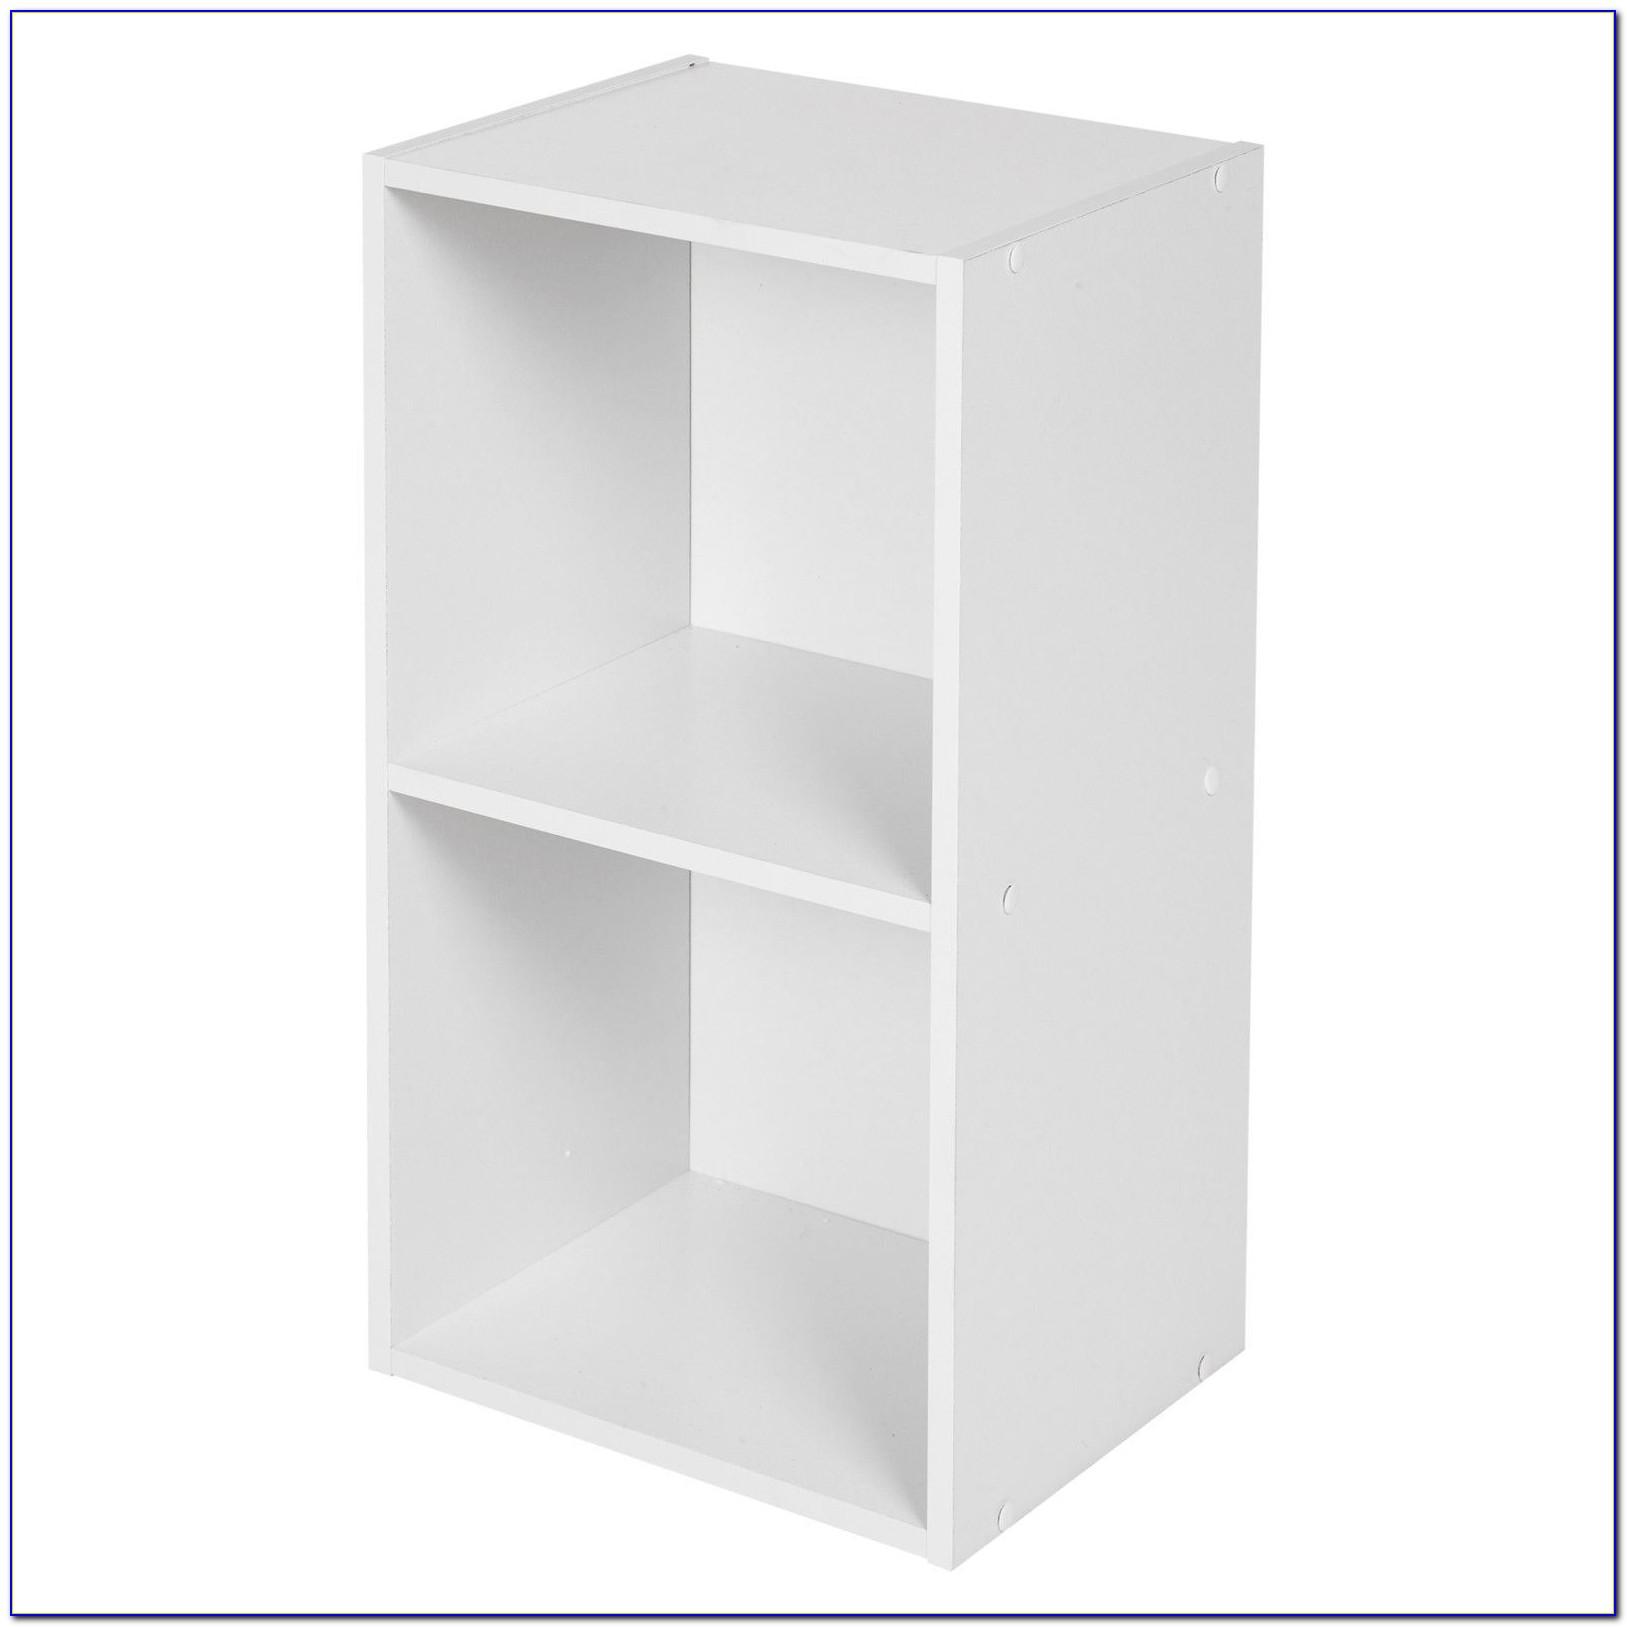 One Bookshelf